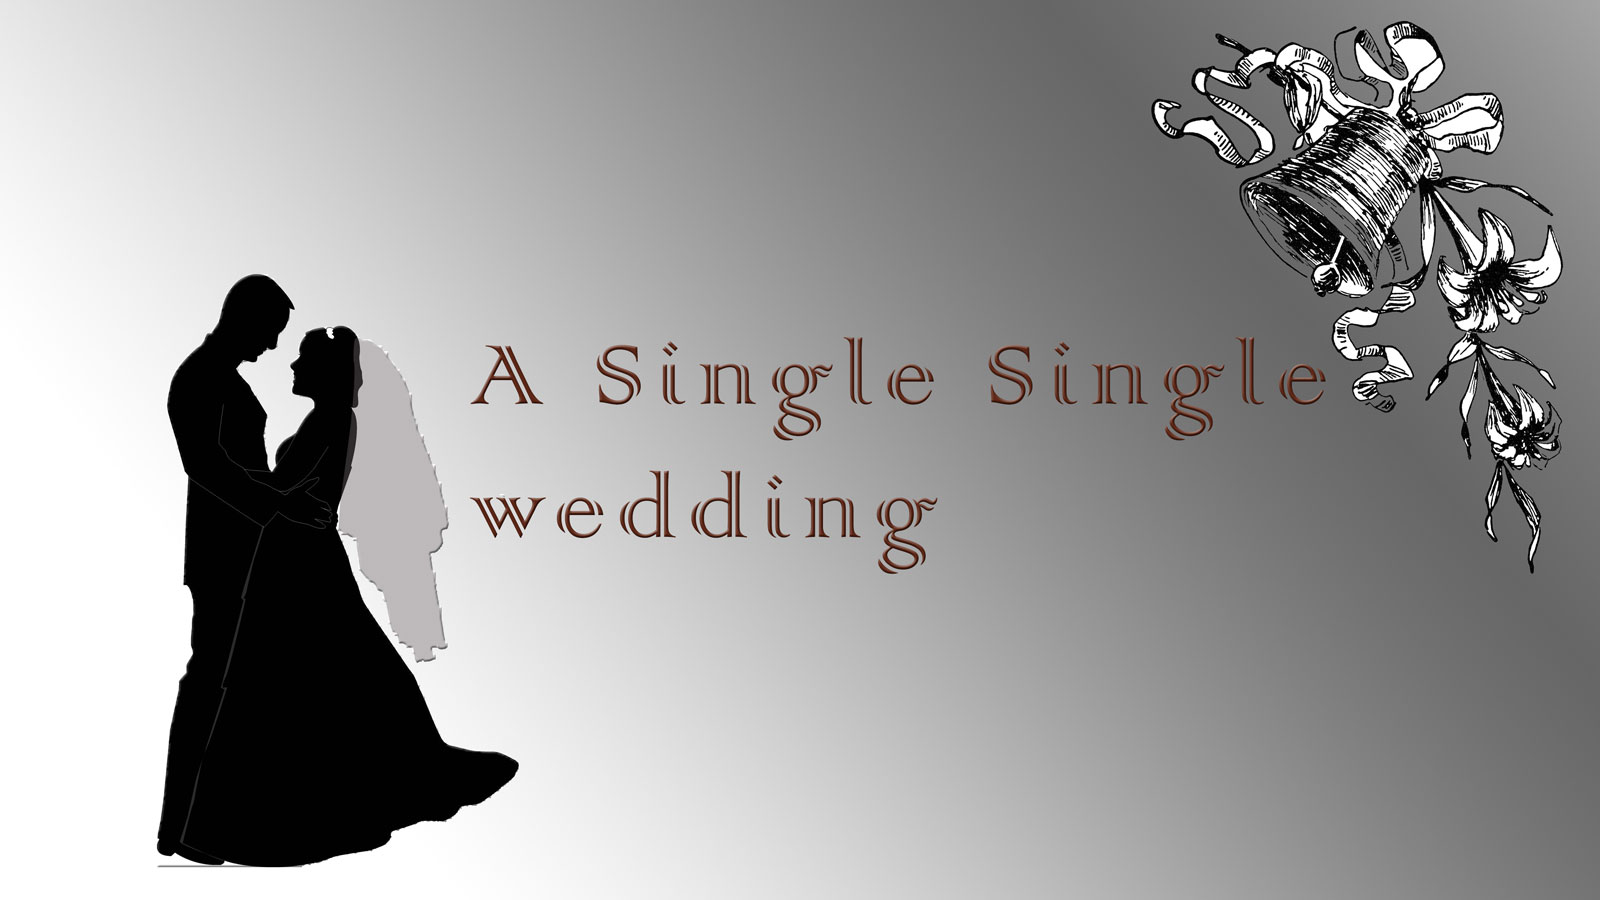 Wedding Bells Are Ringing on Single Single